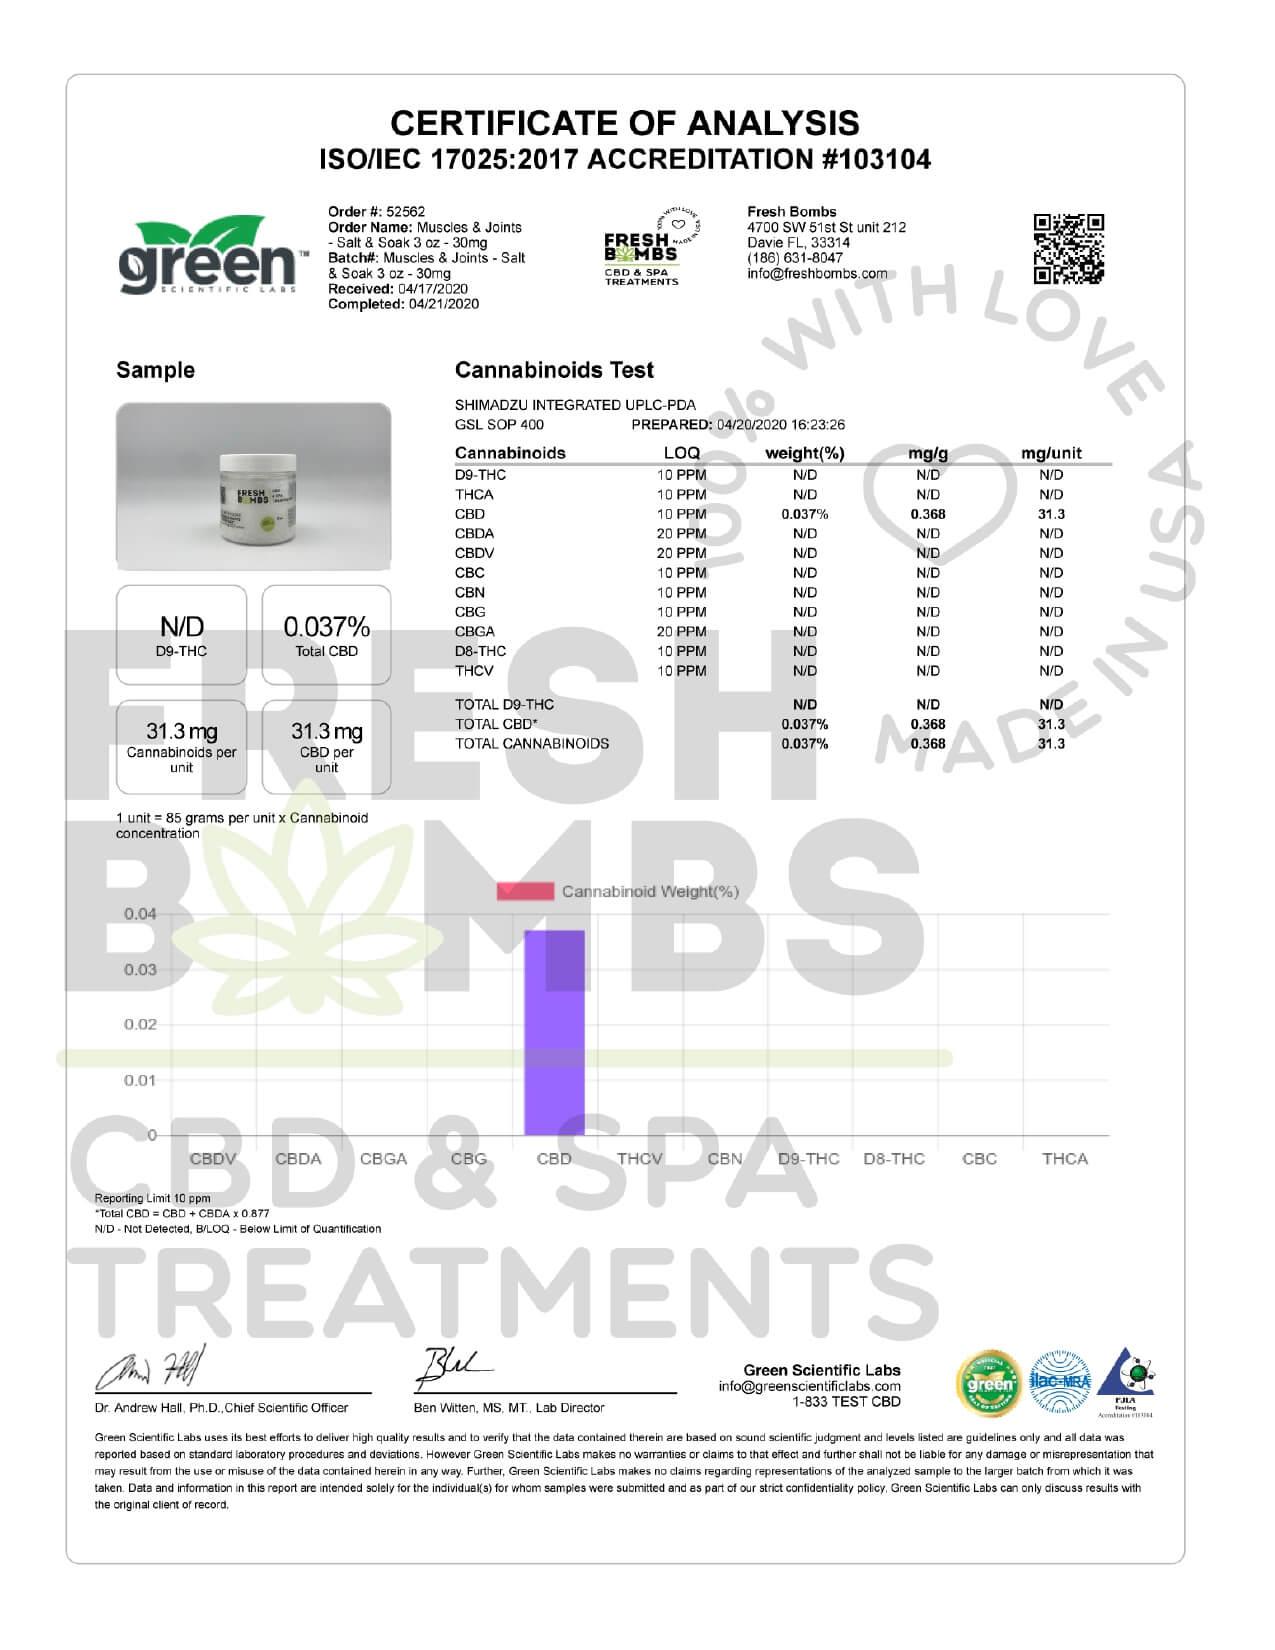 Fresh Bombs CBD Bath Muscle and Joint Bath Soak 3oz 30mg Lab Report